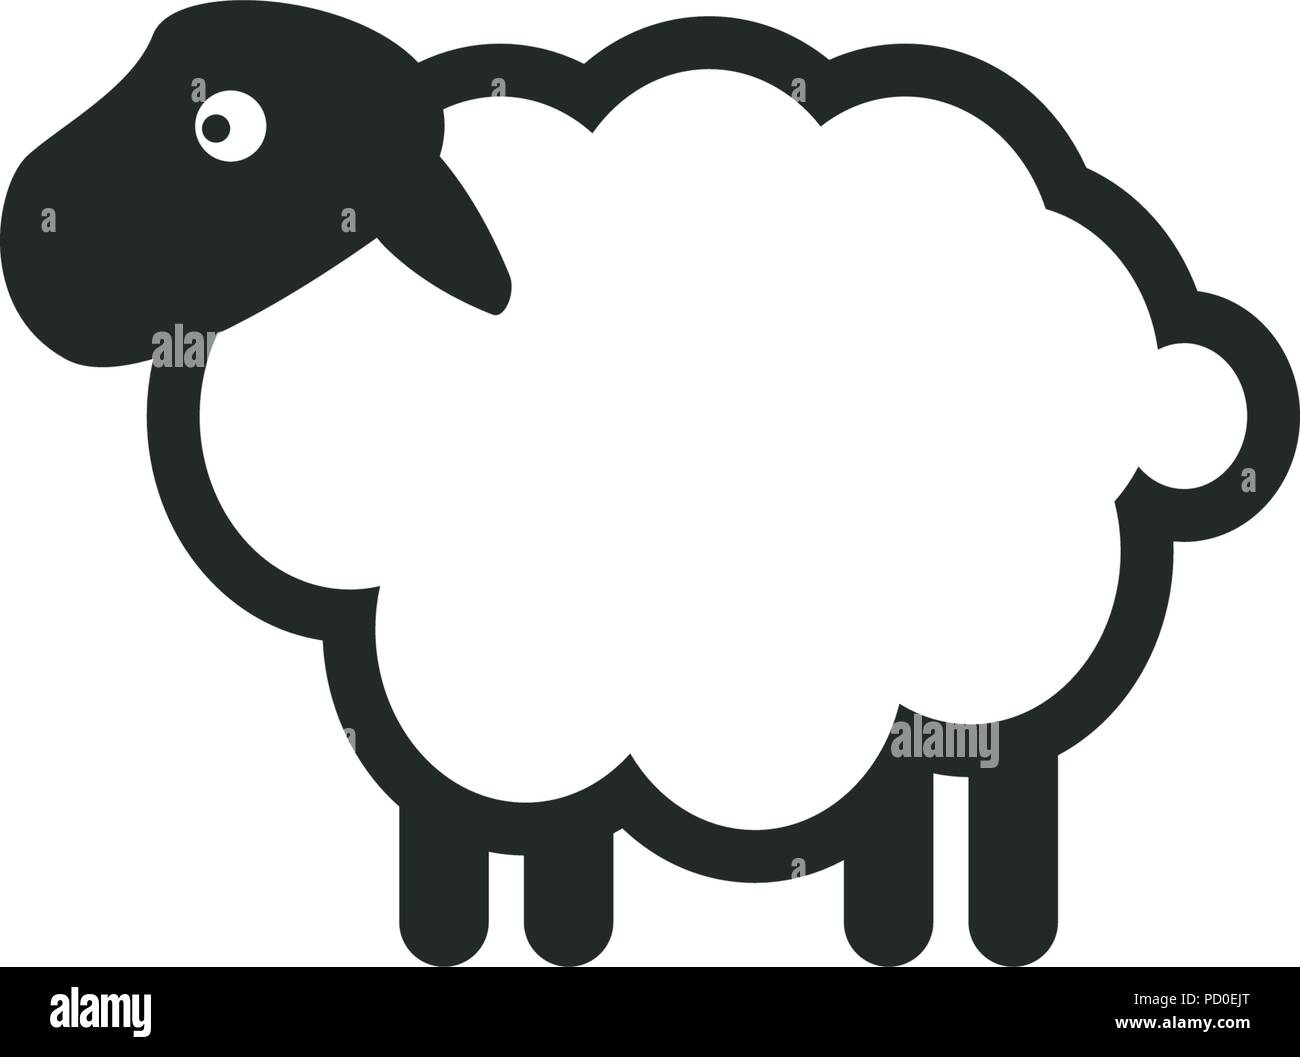 Sheep logo icon template Stock Vector Art & Illustration